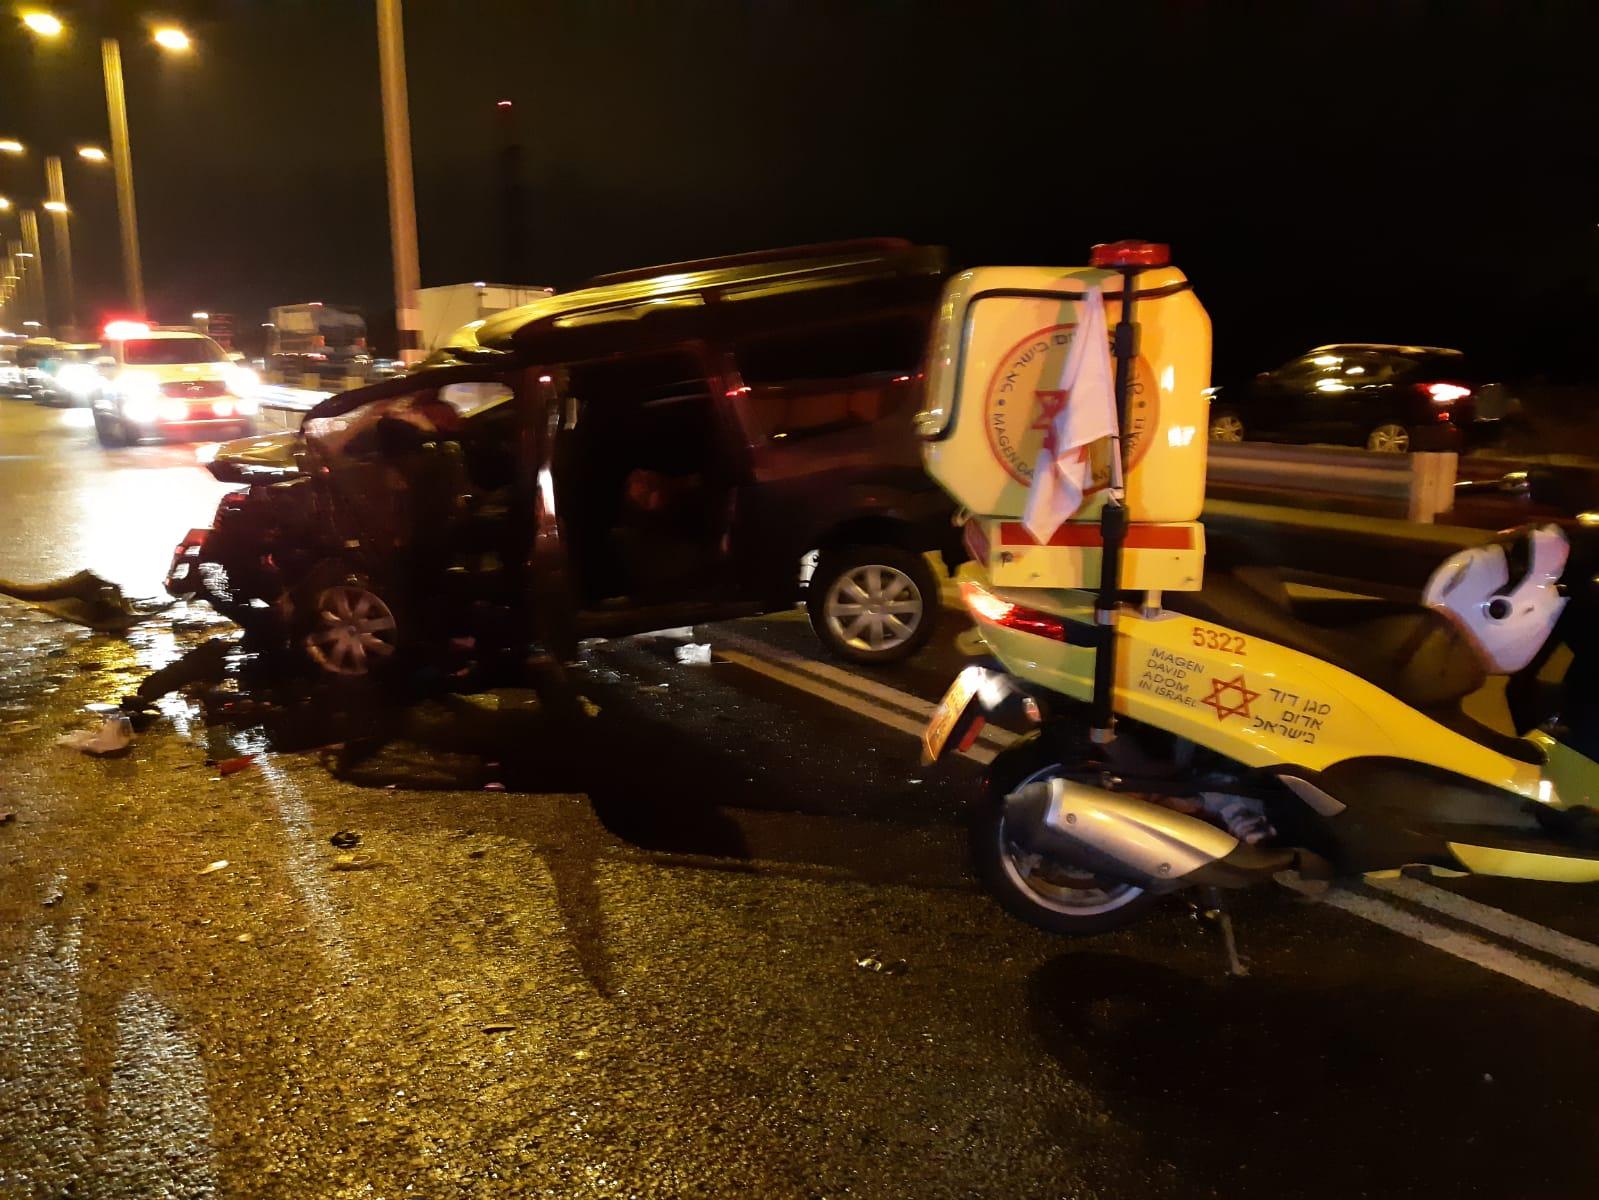 Photo of צפו: נסע נגד כיוון התנועה וגרם לתאונה קשה הלילה בכביש 4 ליד נחל חדרה עם מעורבות 5 רכבים, 8 פצועים